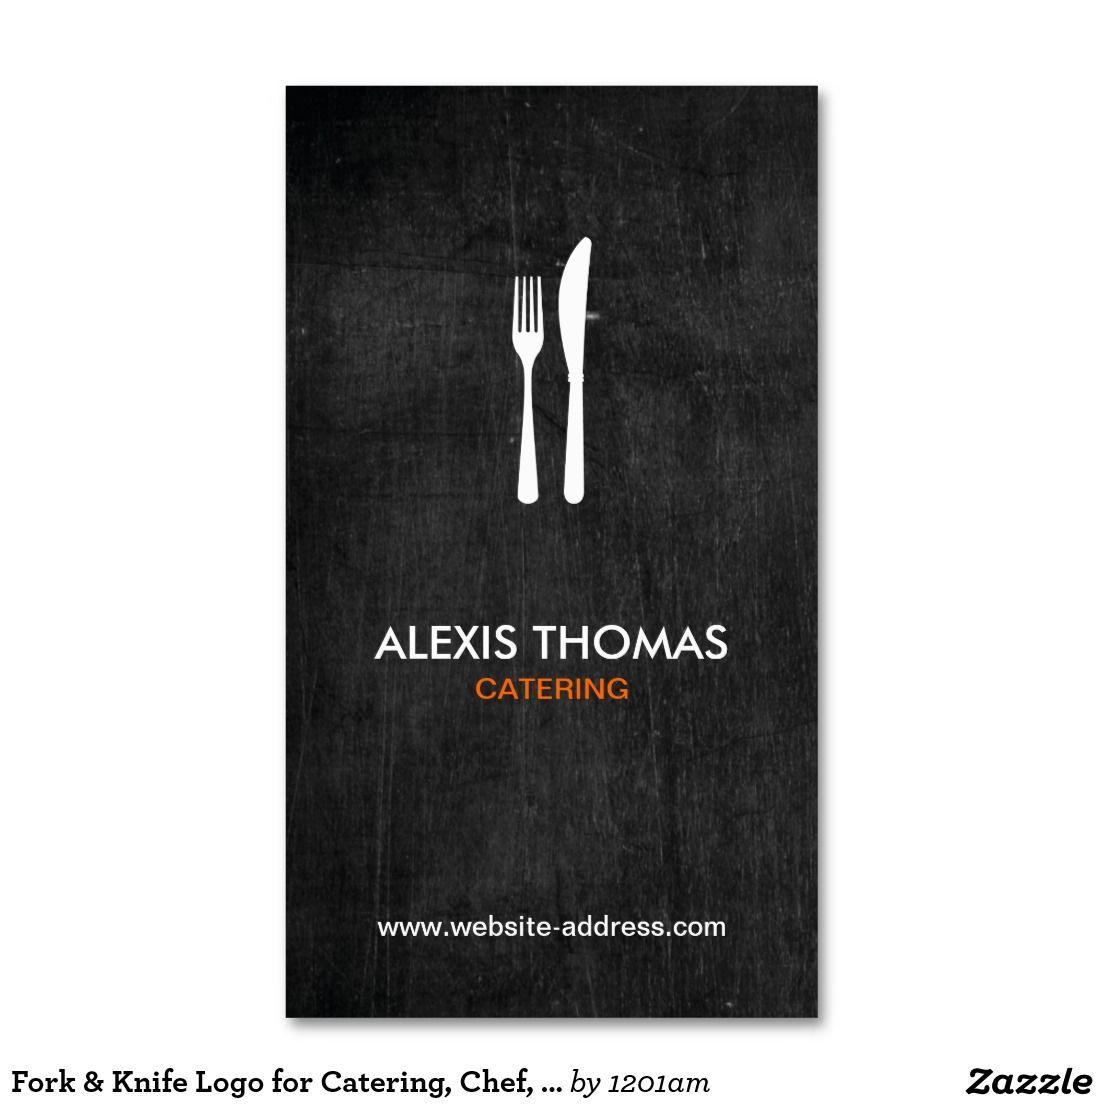 Gabel U Messer Logo Für Catering Koch Visitenkarte